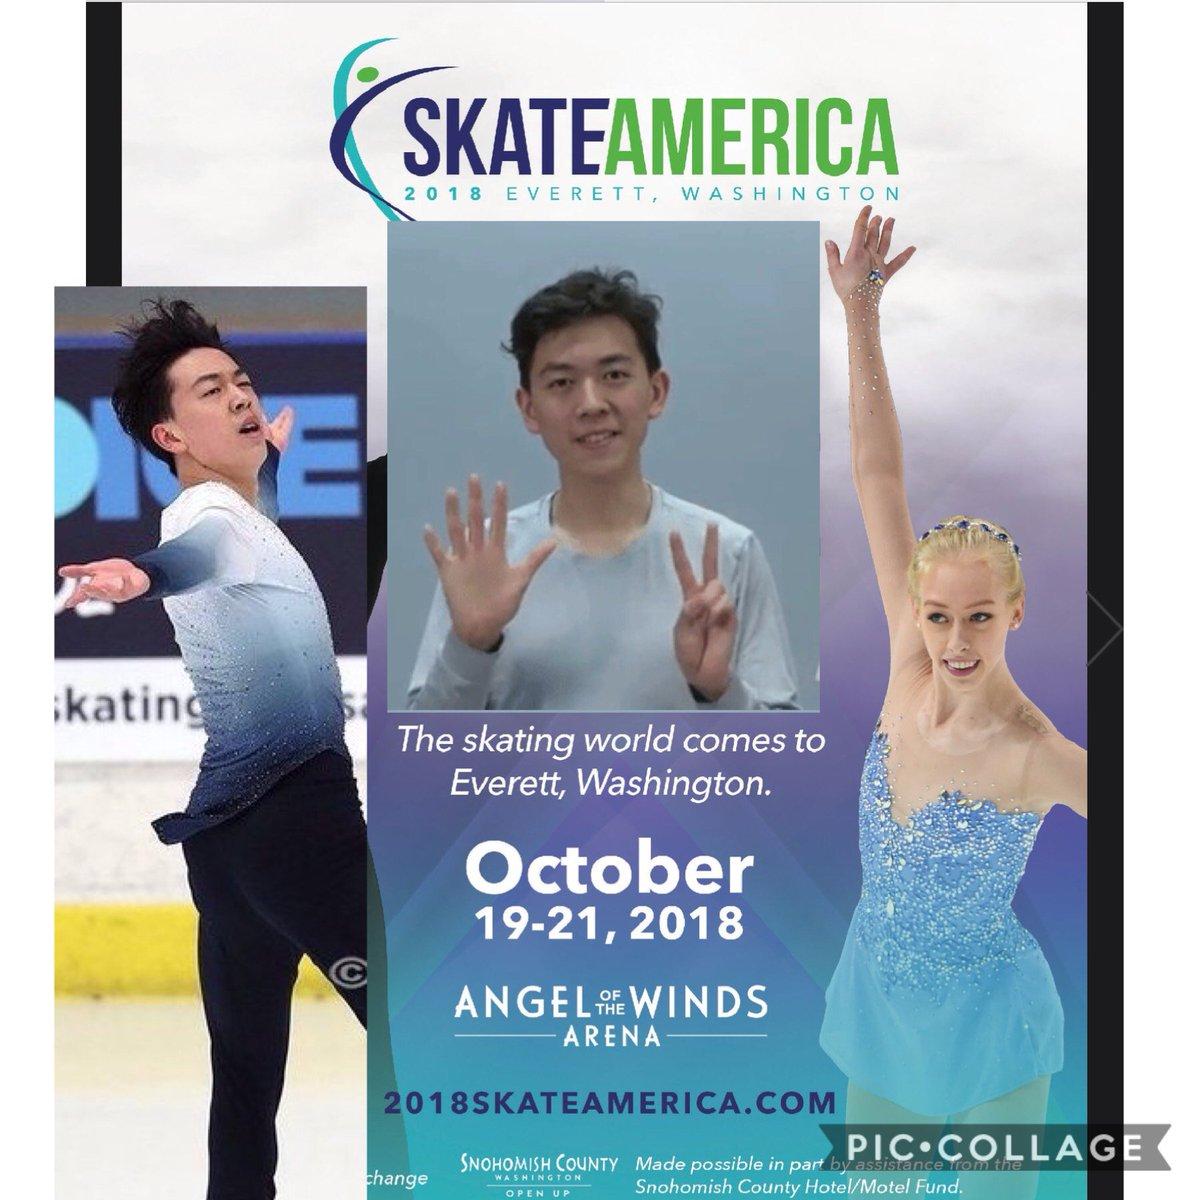 GP - 1 этап. Oct 19 - Oct 21 2018  Skate America, Everett, WA /USA DpW0Jx8U0AAA8H-